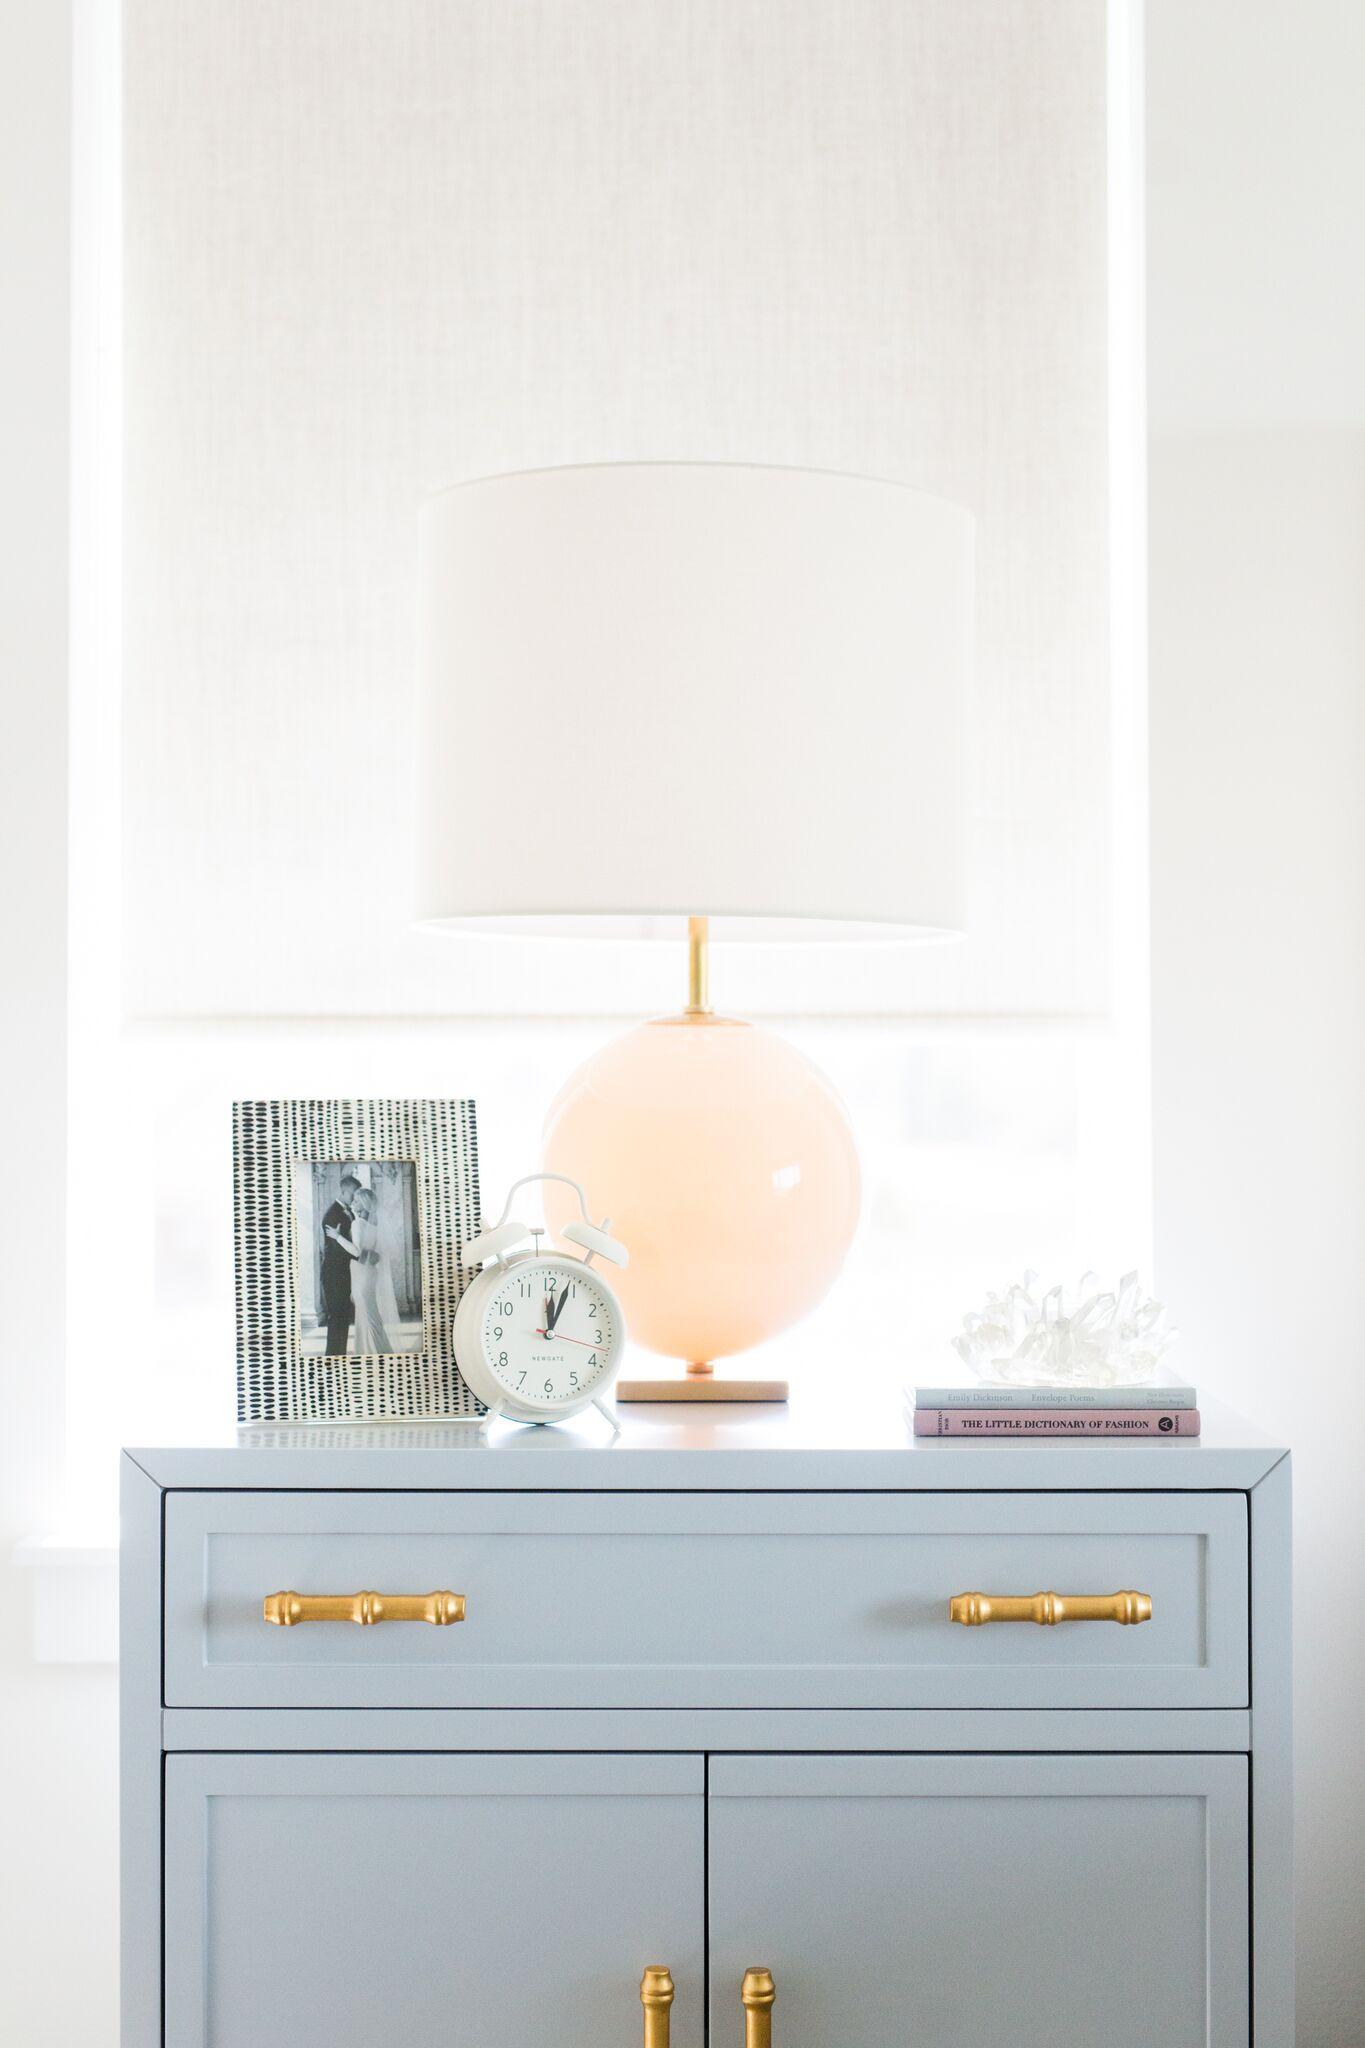 Peach lamp atop blue nightstand